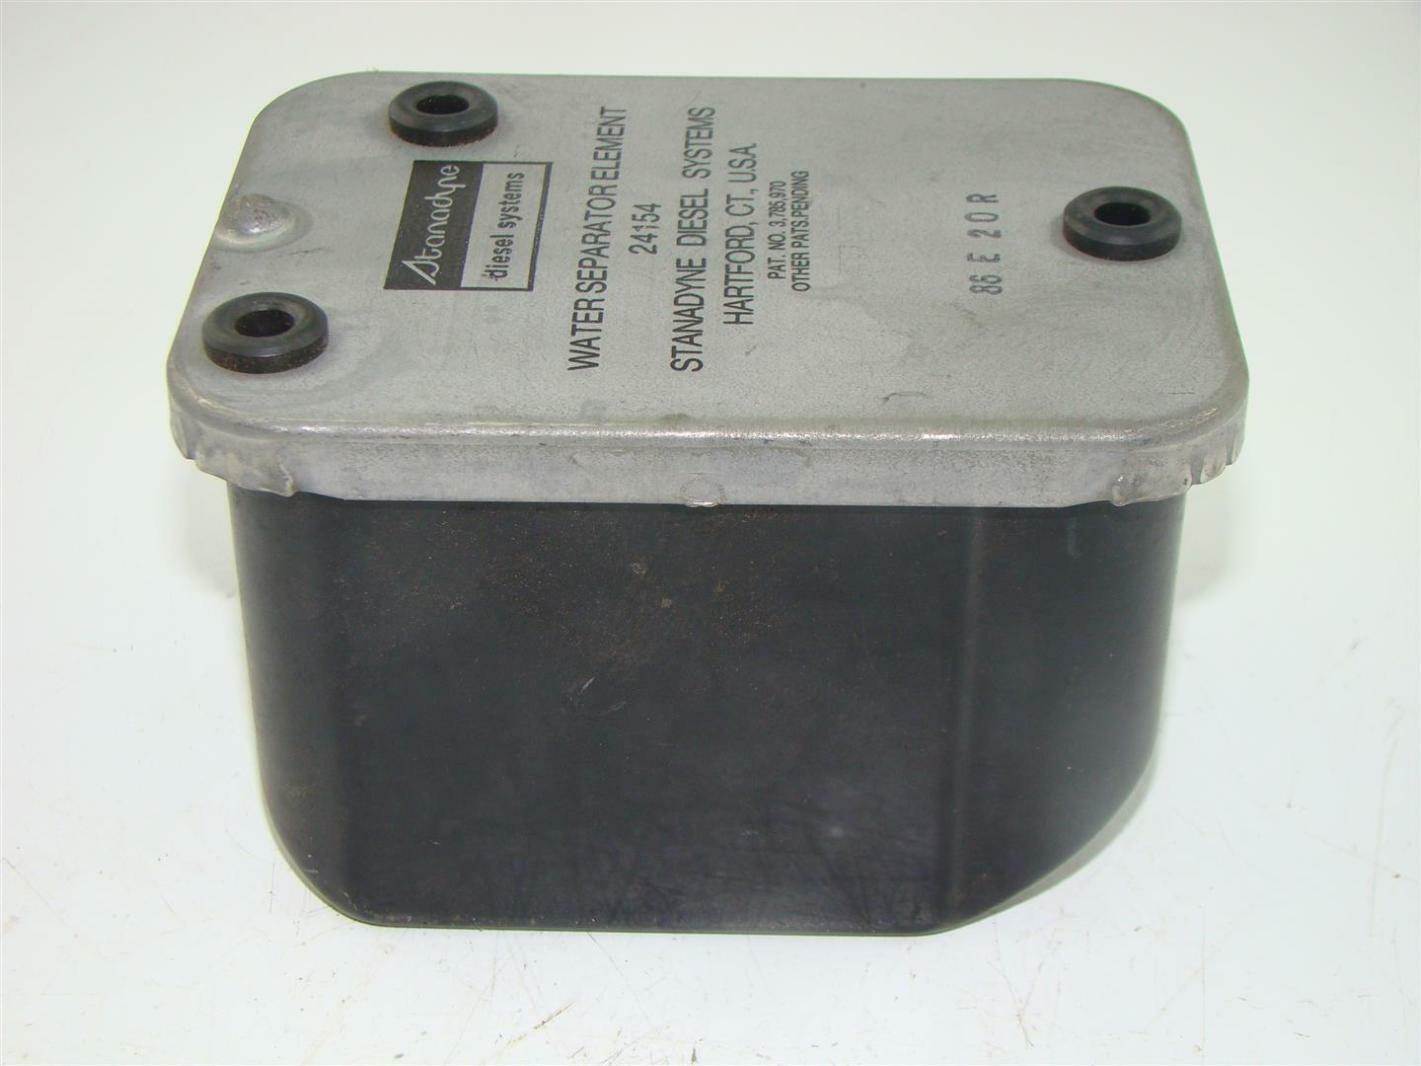 Stanadyne Fuel Filter Housing Screen Wiring Diesel Water Separator System 24154